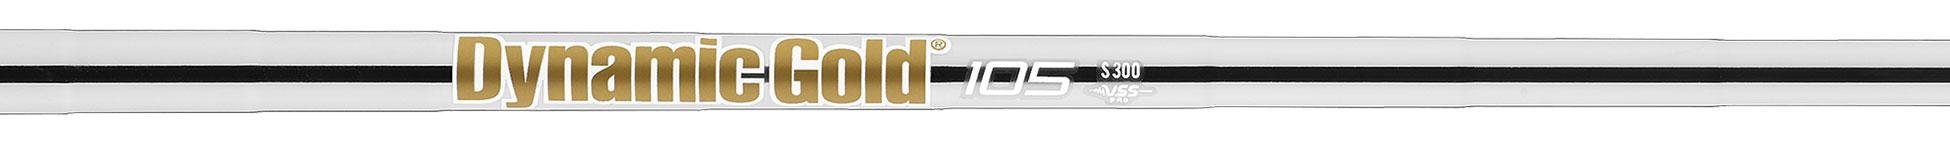 True Temper Dynamic Gold 105 VSS